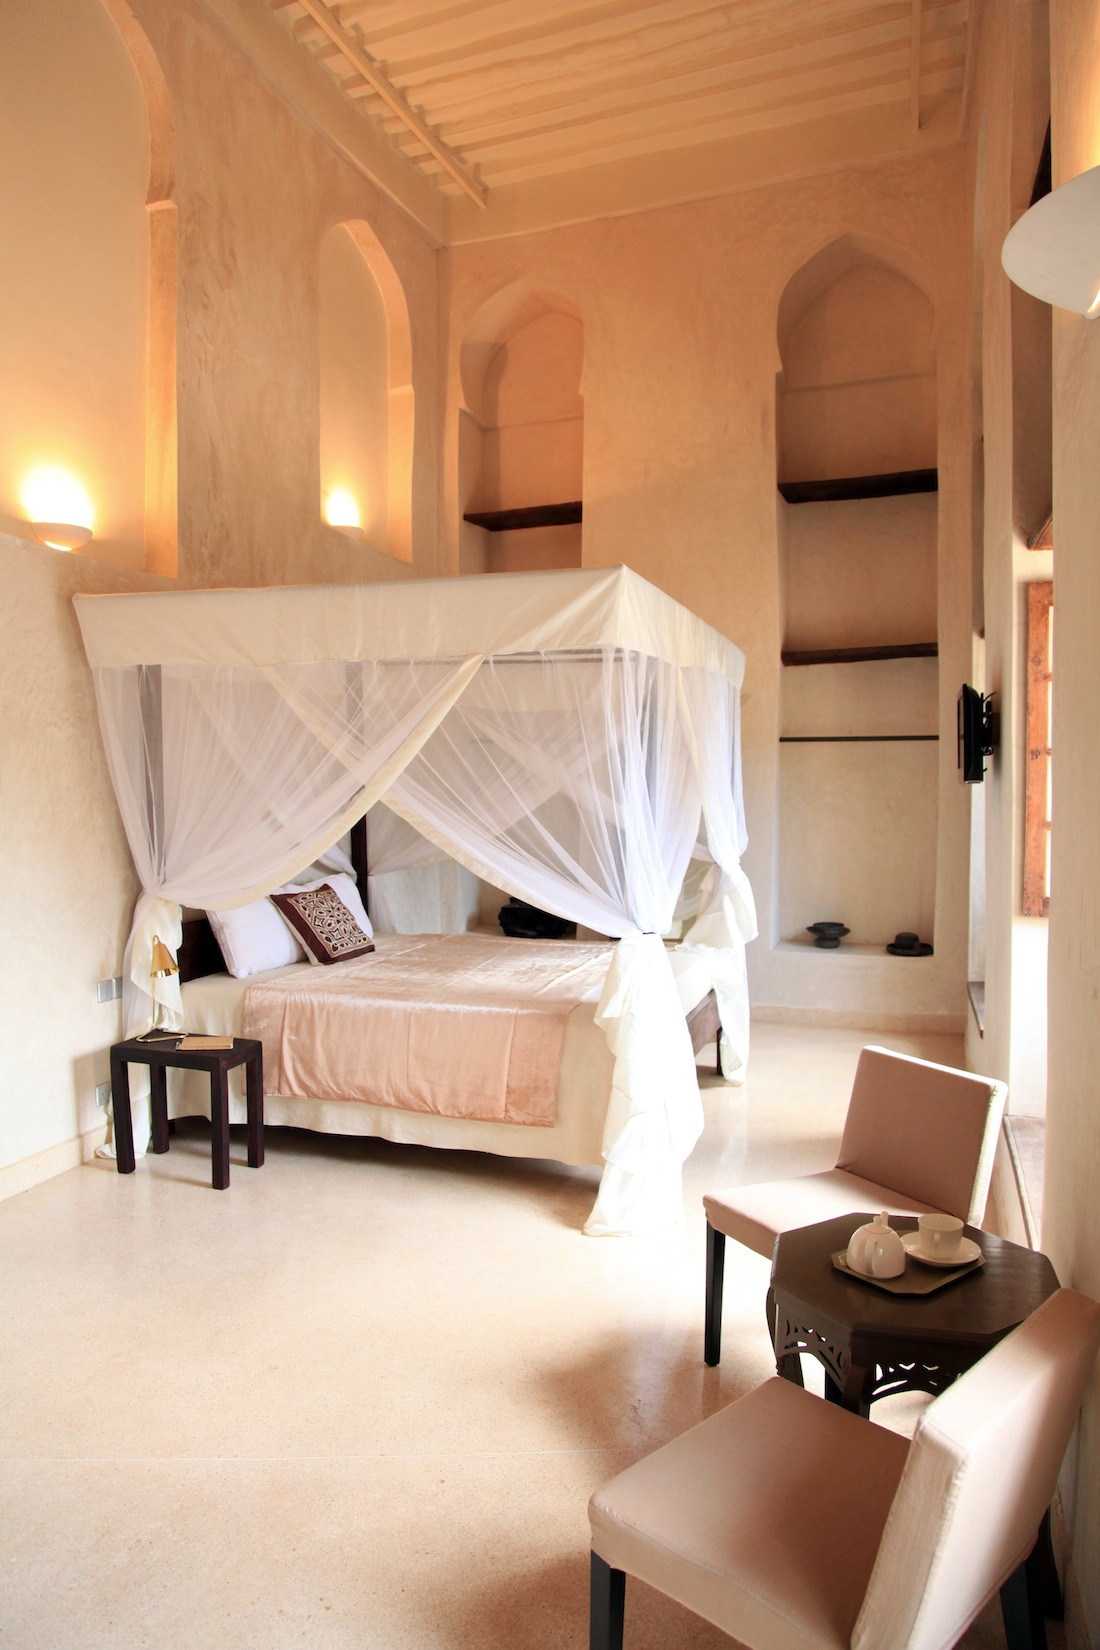 Mashariki-palace-hotel-zanzibar-stone-town-chambres-rooms-03